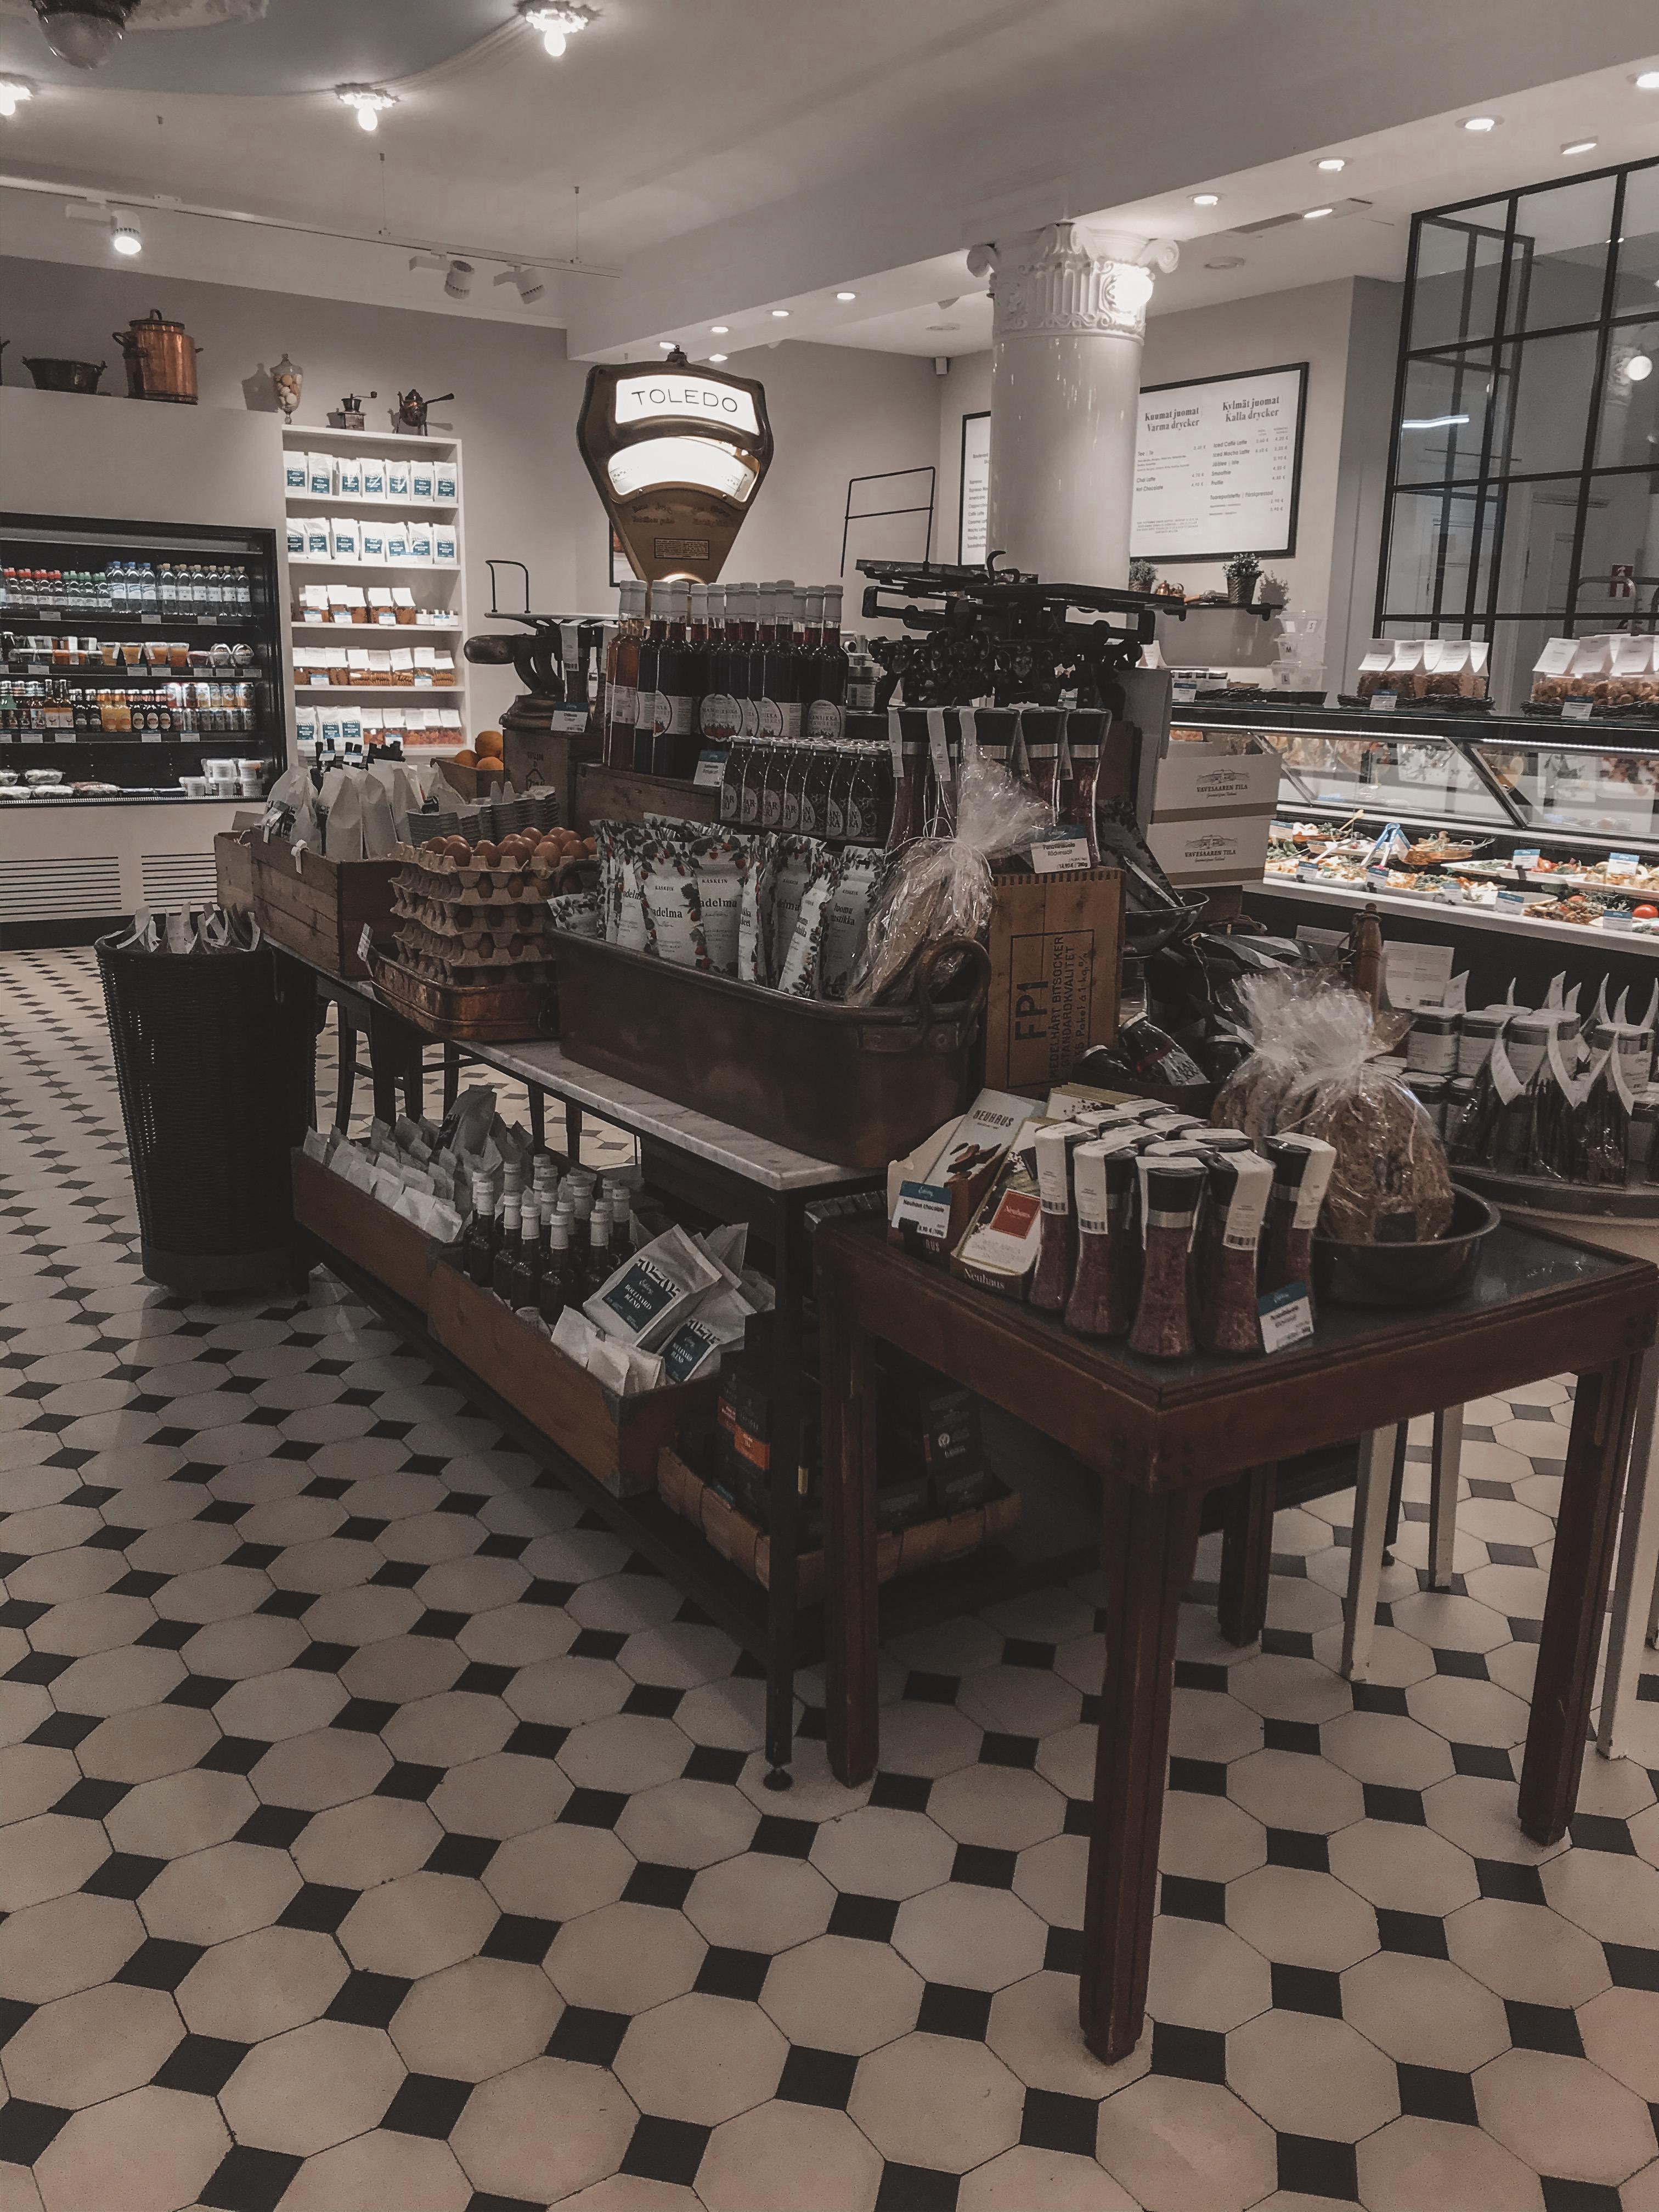 Cafe Ekberg in Helsinki, Finland